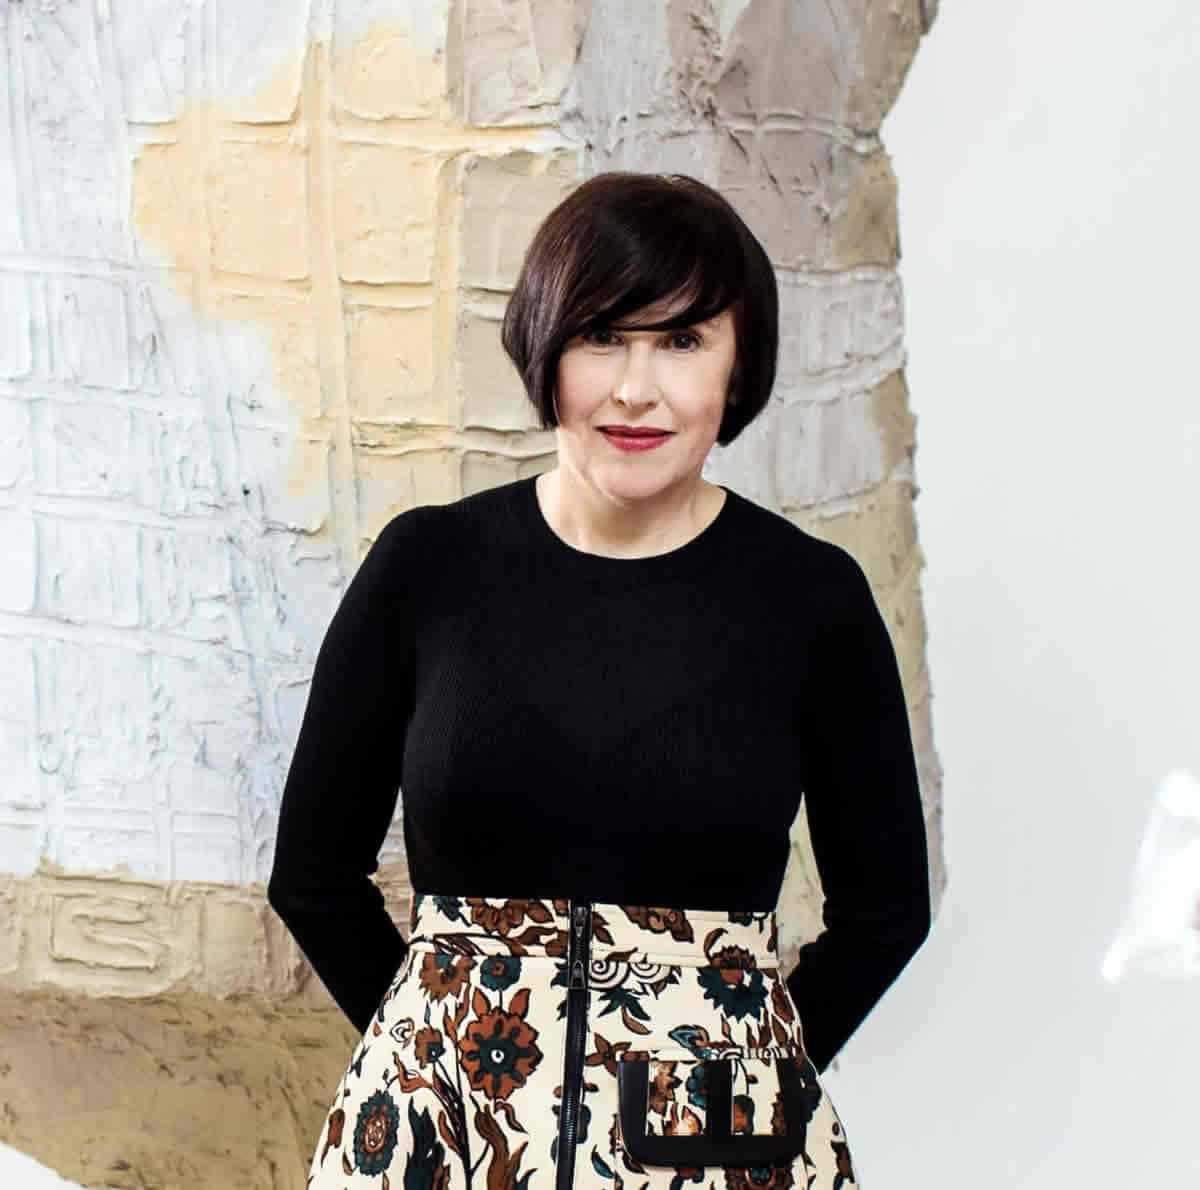 A photo of Alice Rawsthorn, a design critic.